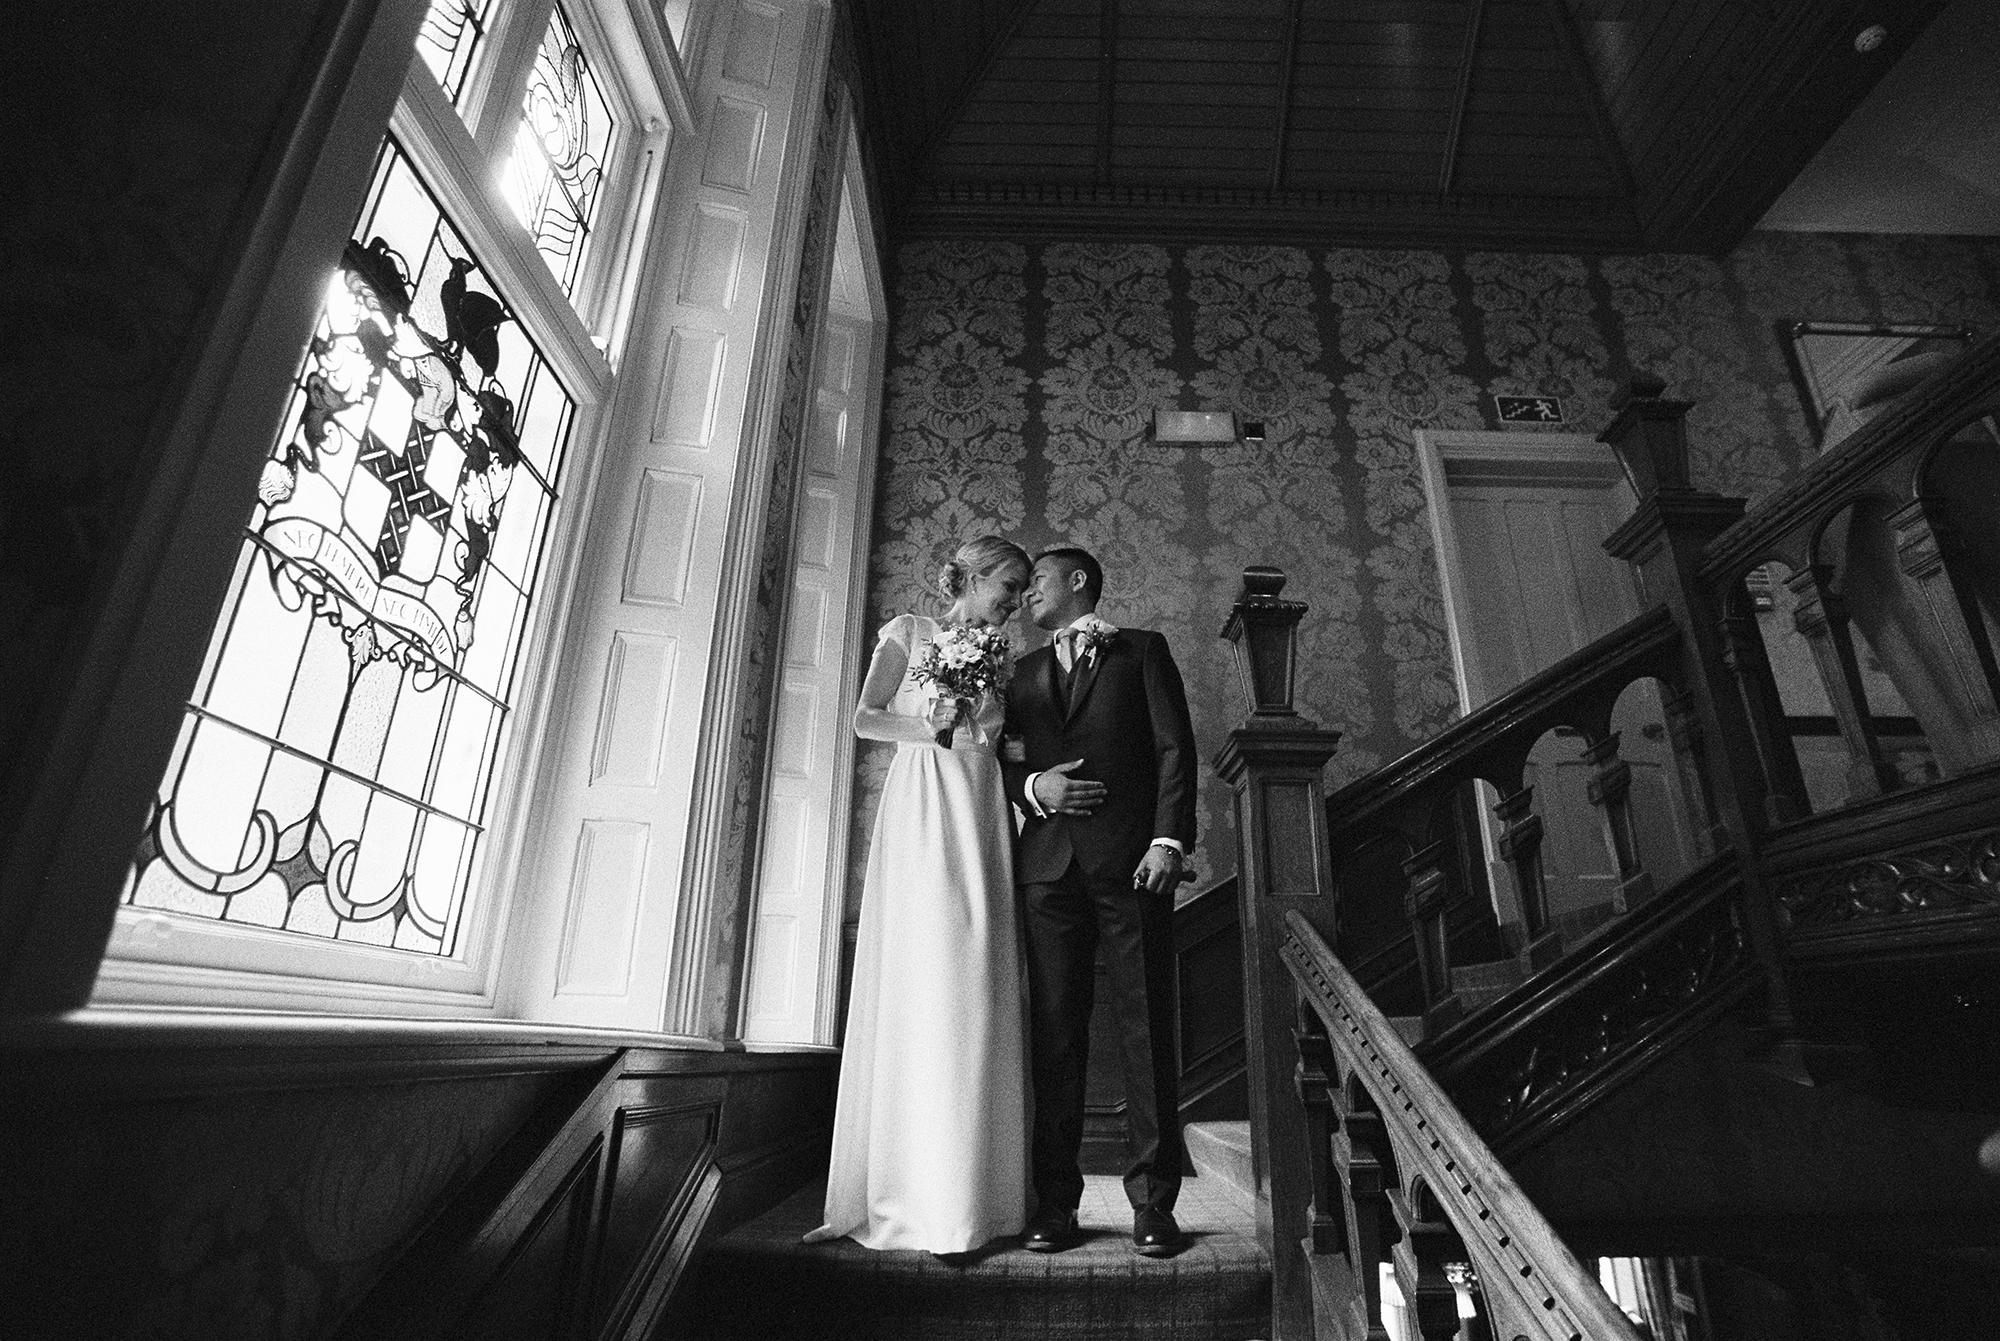 wedding_photographer_cumbria027.jpg